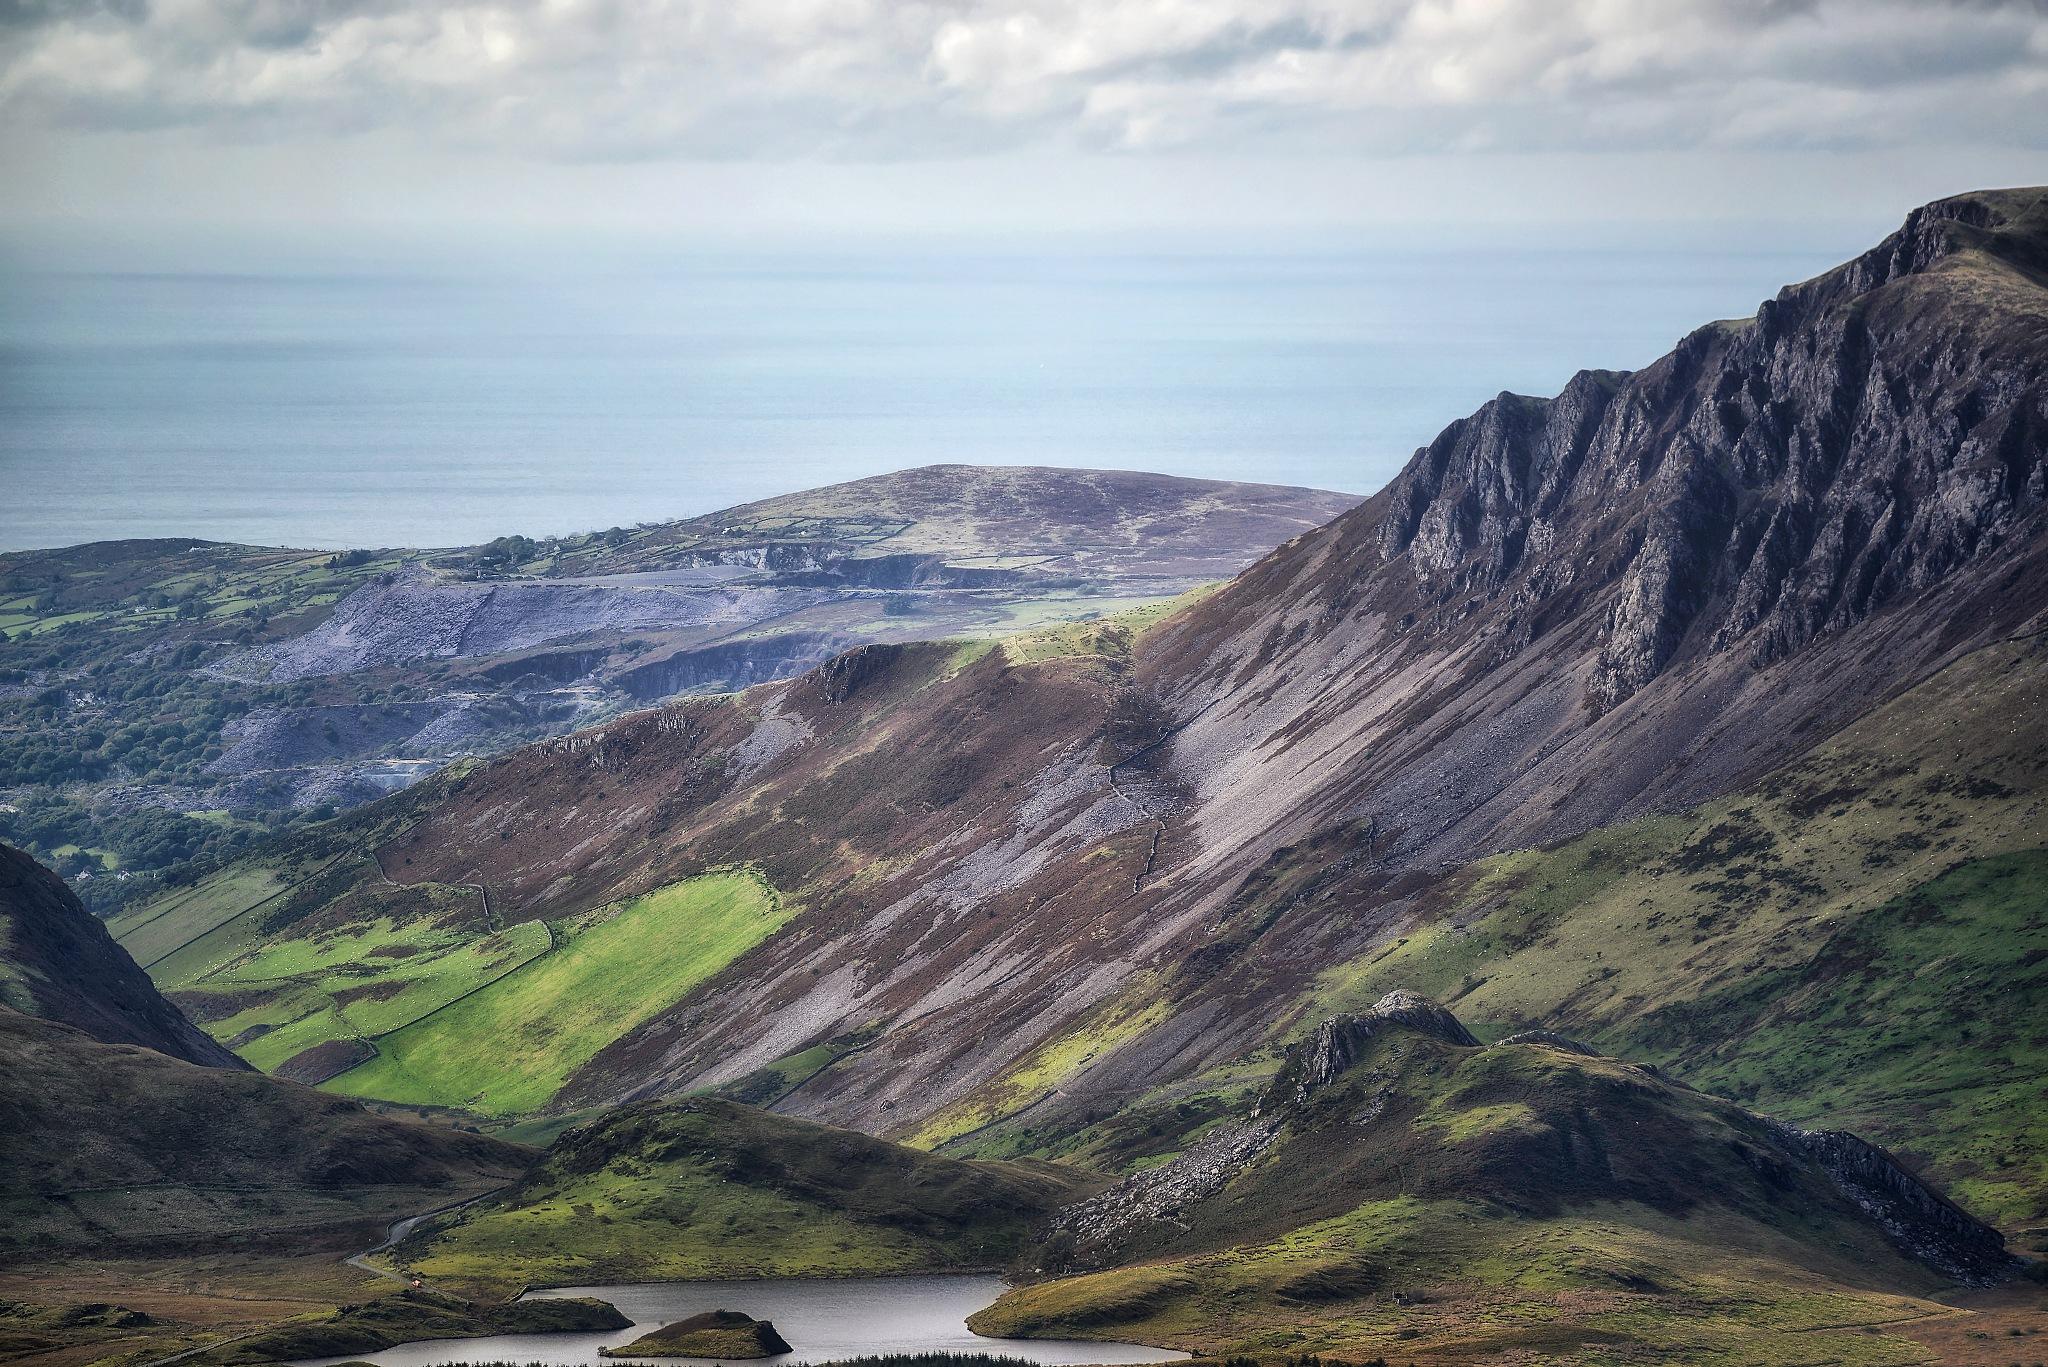 The longest view... by Henrik Wanders